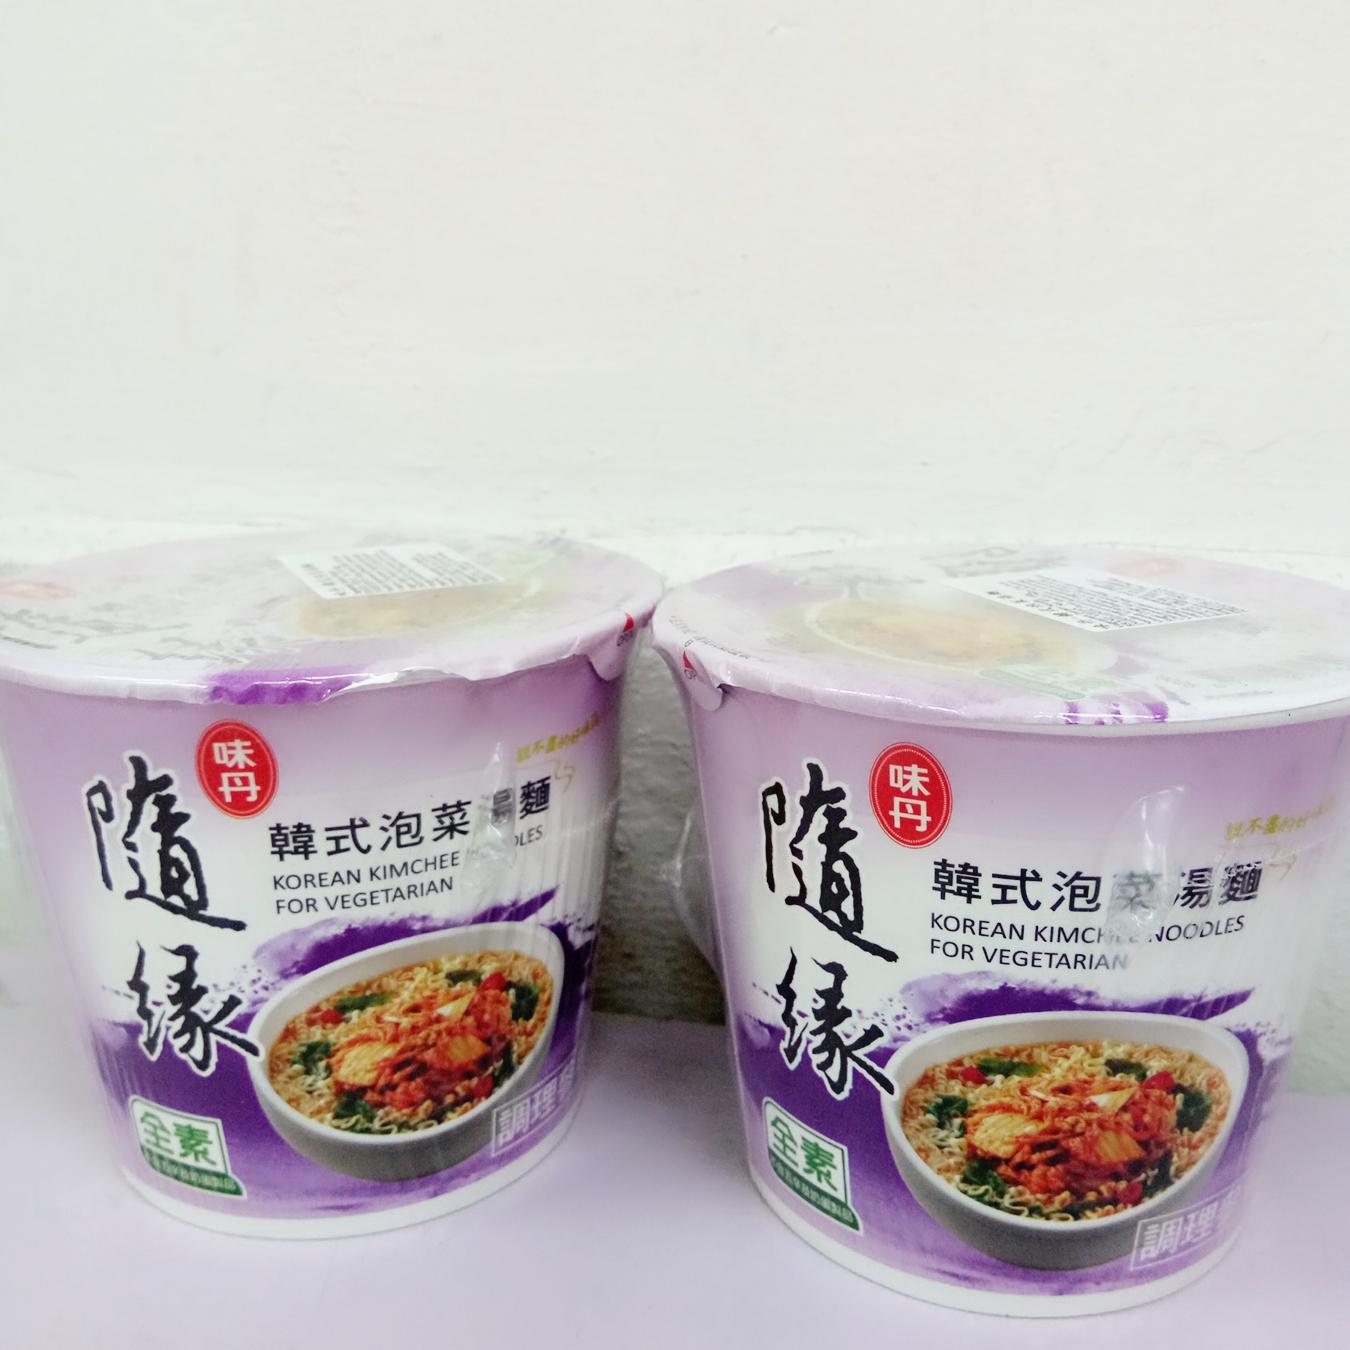 Image Vedan Kimchi Cup noodles 味丹 - 隨缘韩式泡菜杯面 60grams